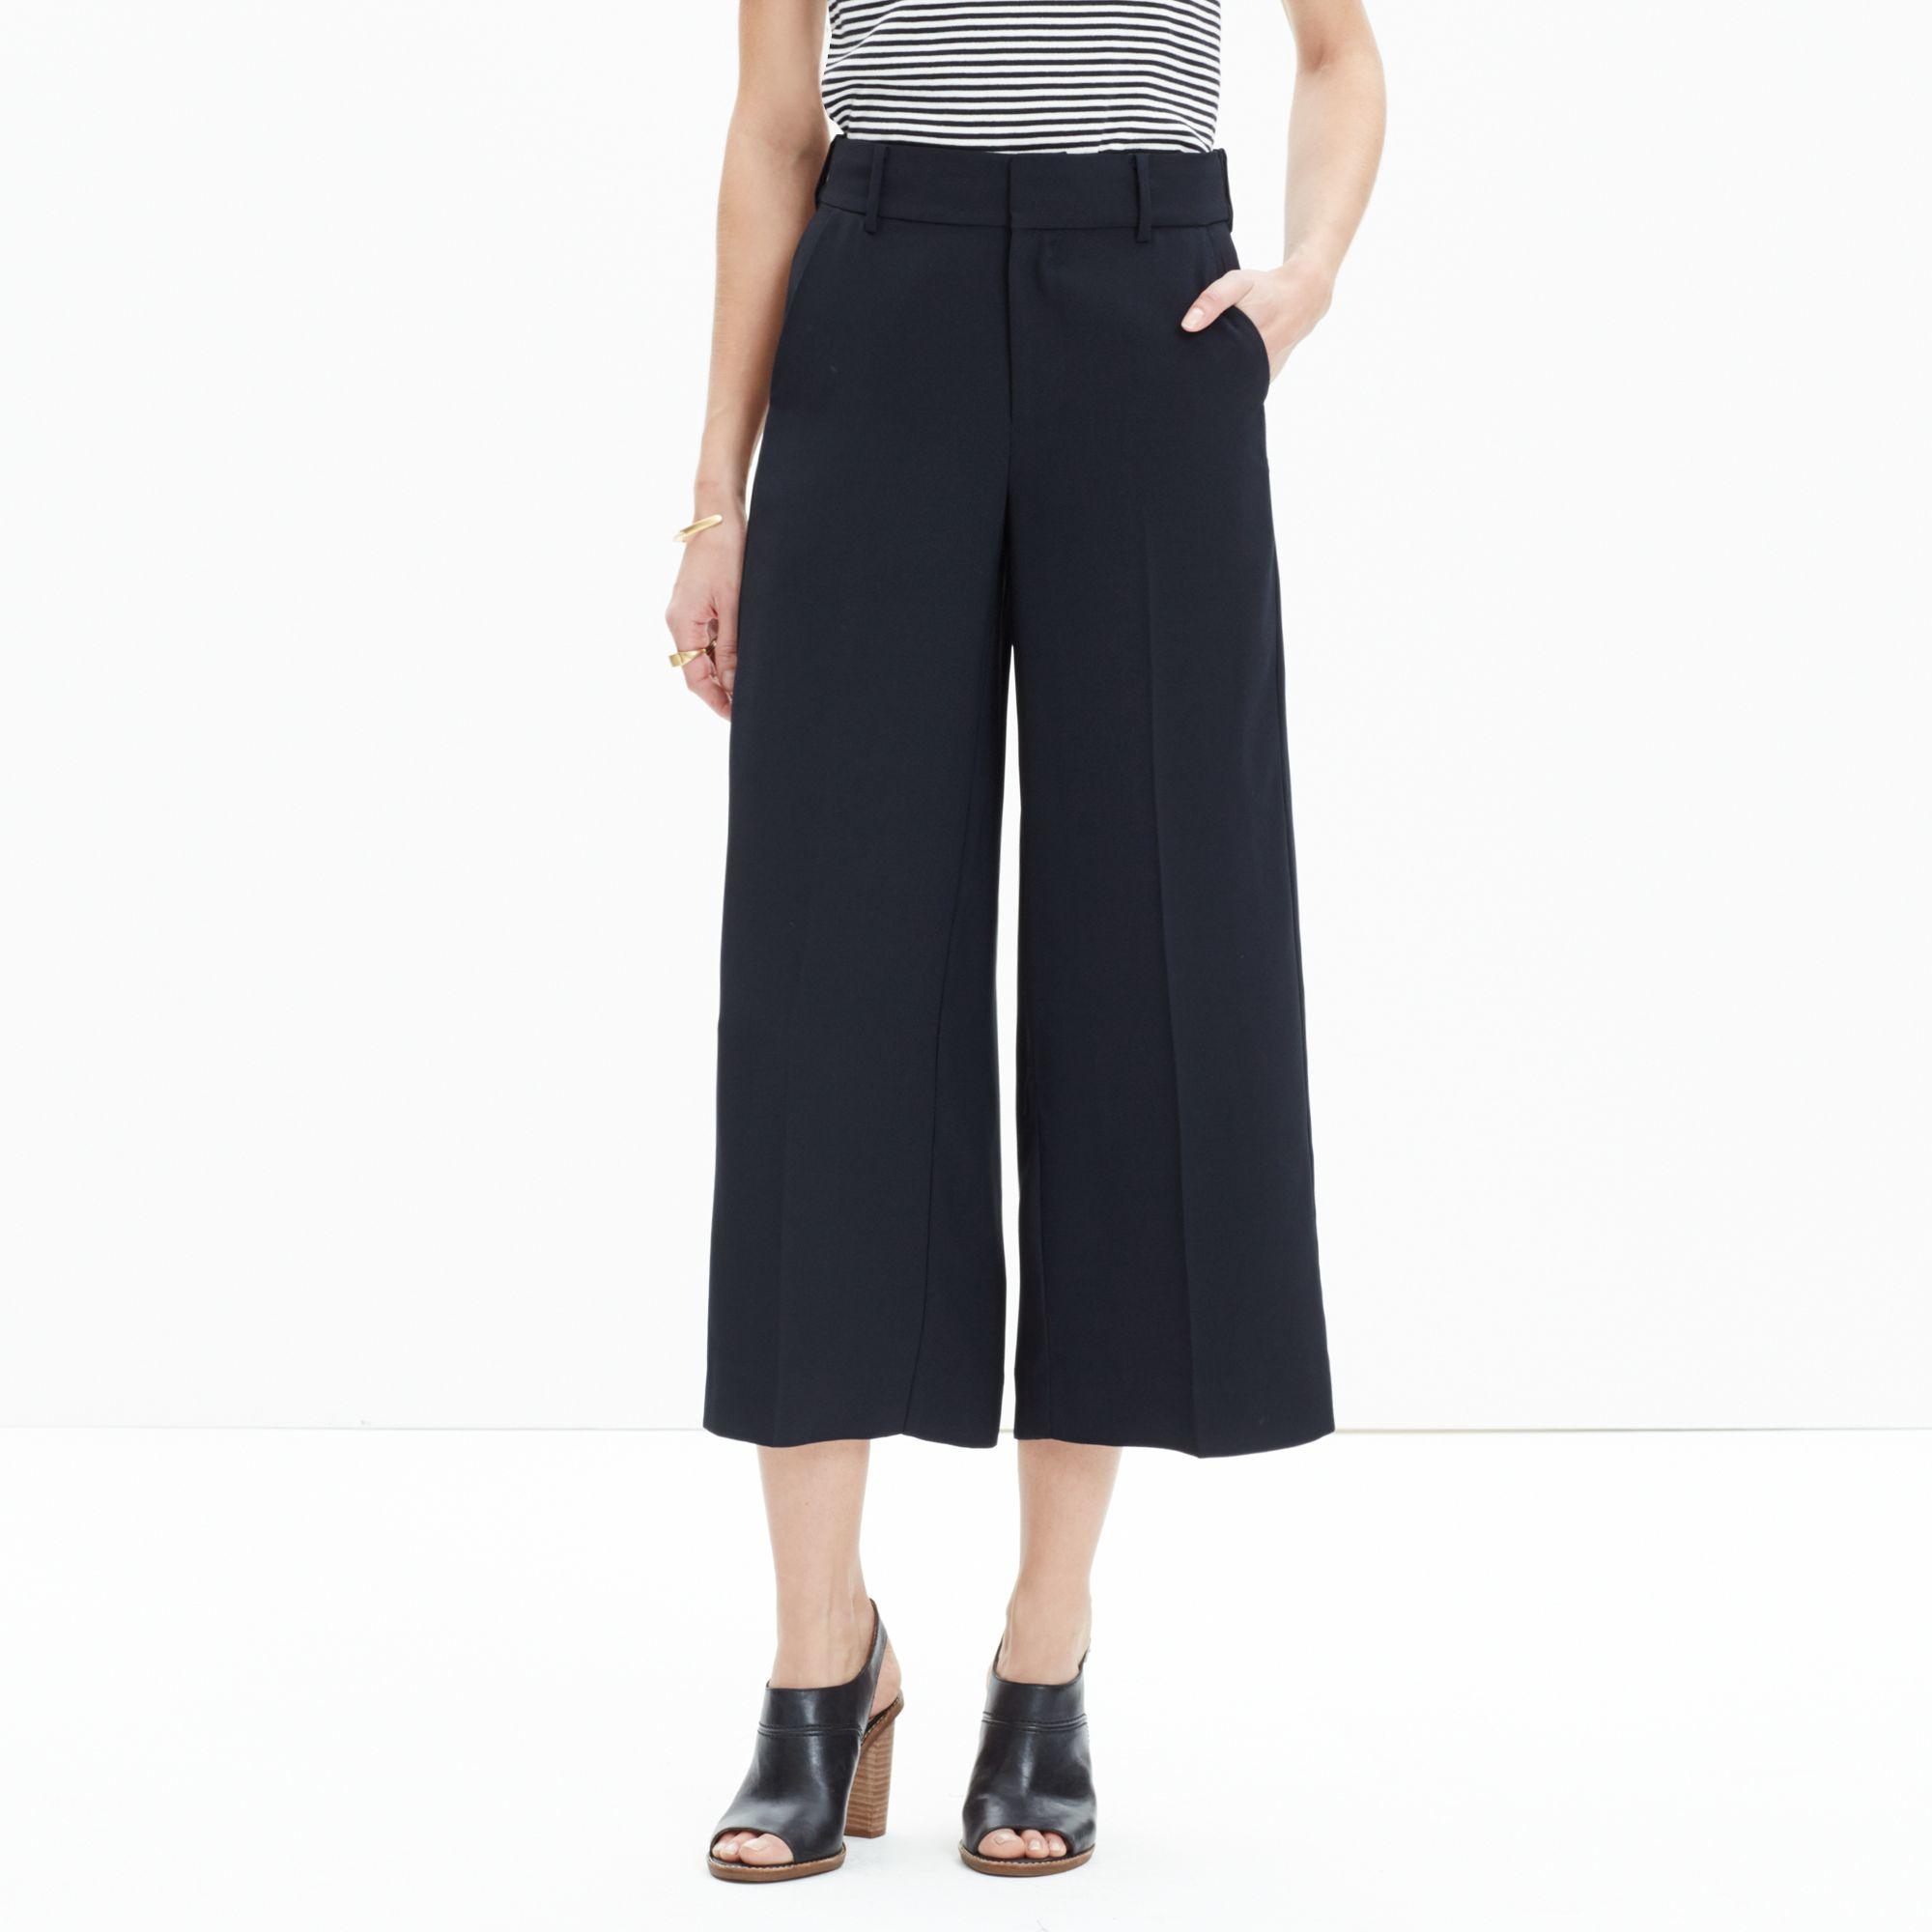 bb7d6805e0 Lyst - Madewell Stockton Culotte Pants in Black